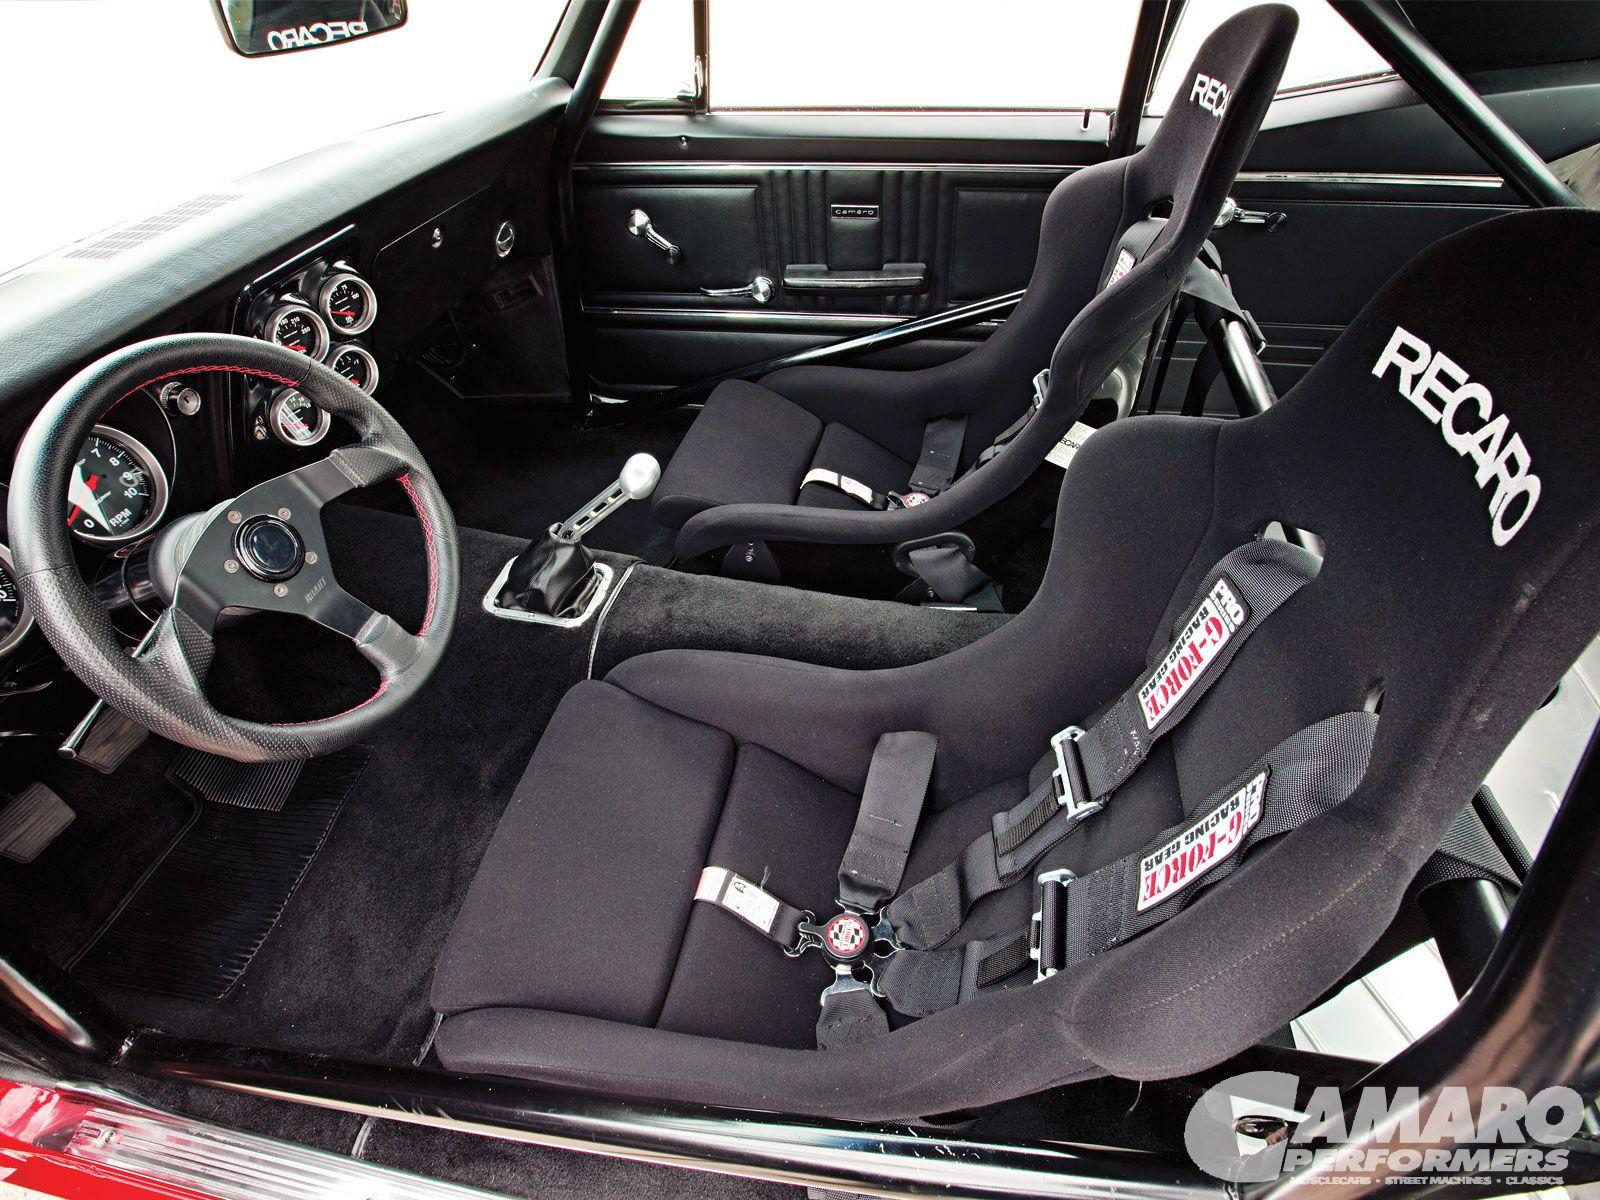 Chevrolet Camaro Muscle Car Muchas Imagenes Chevrolet Camaro Camaro Chevrolet